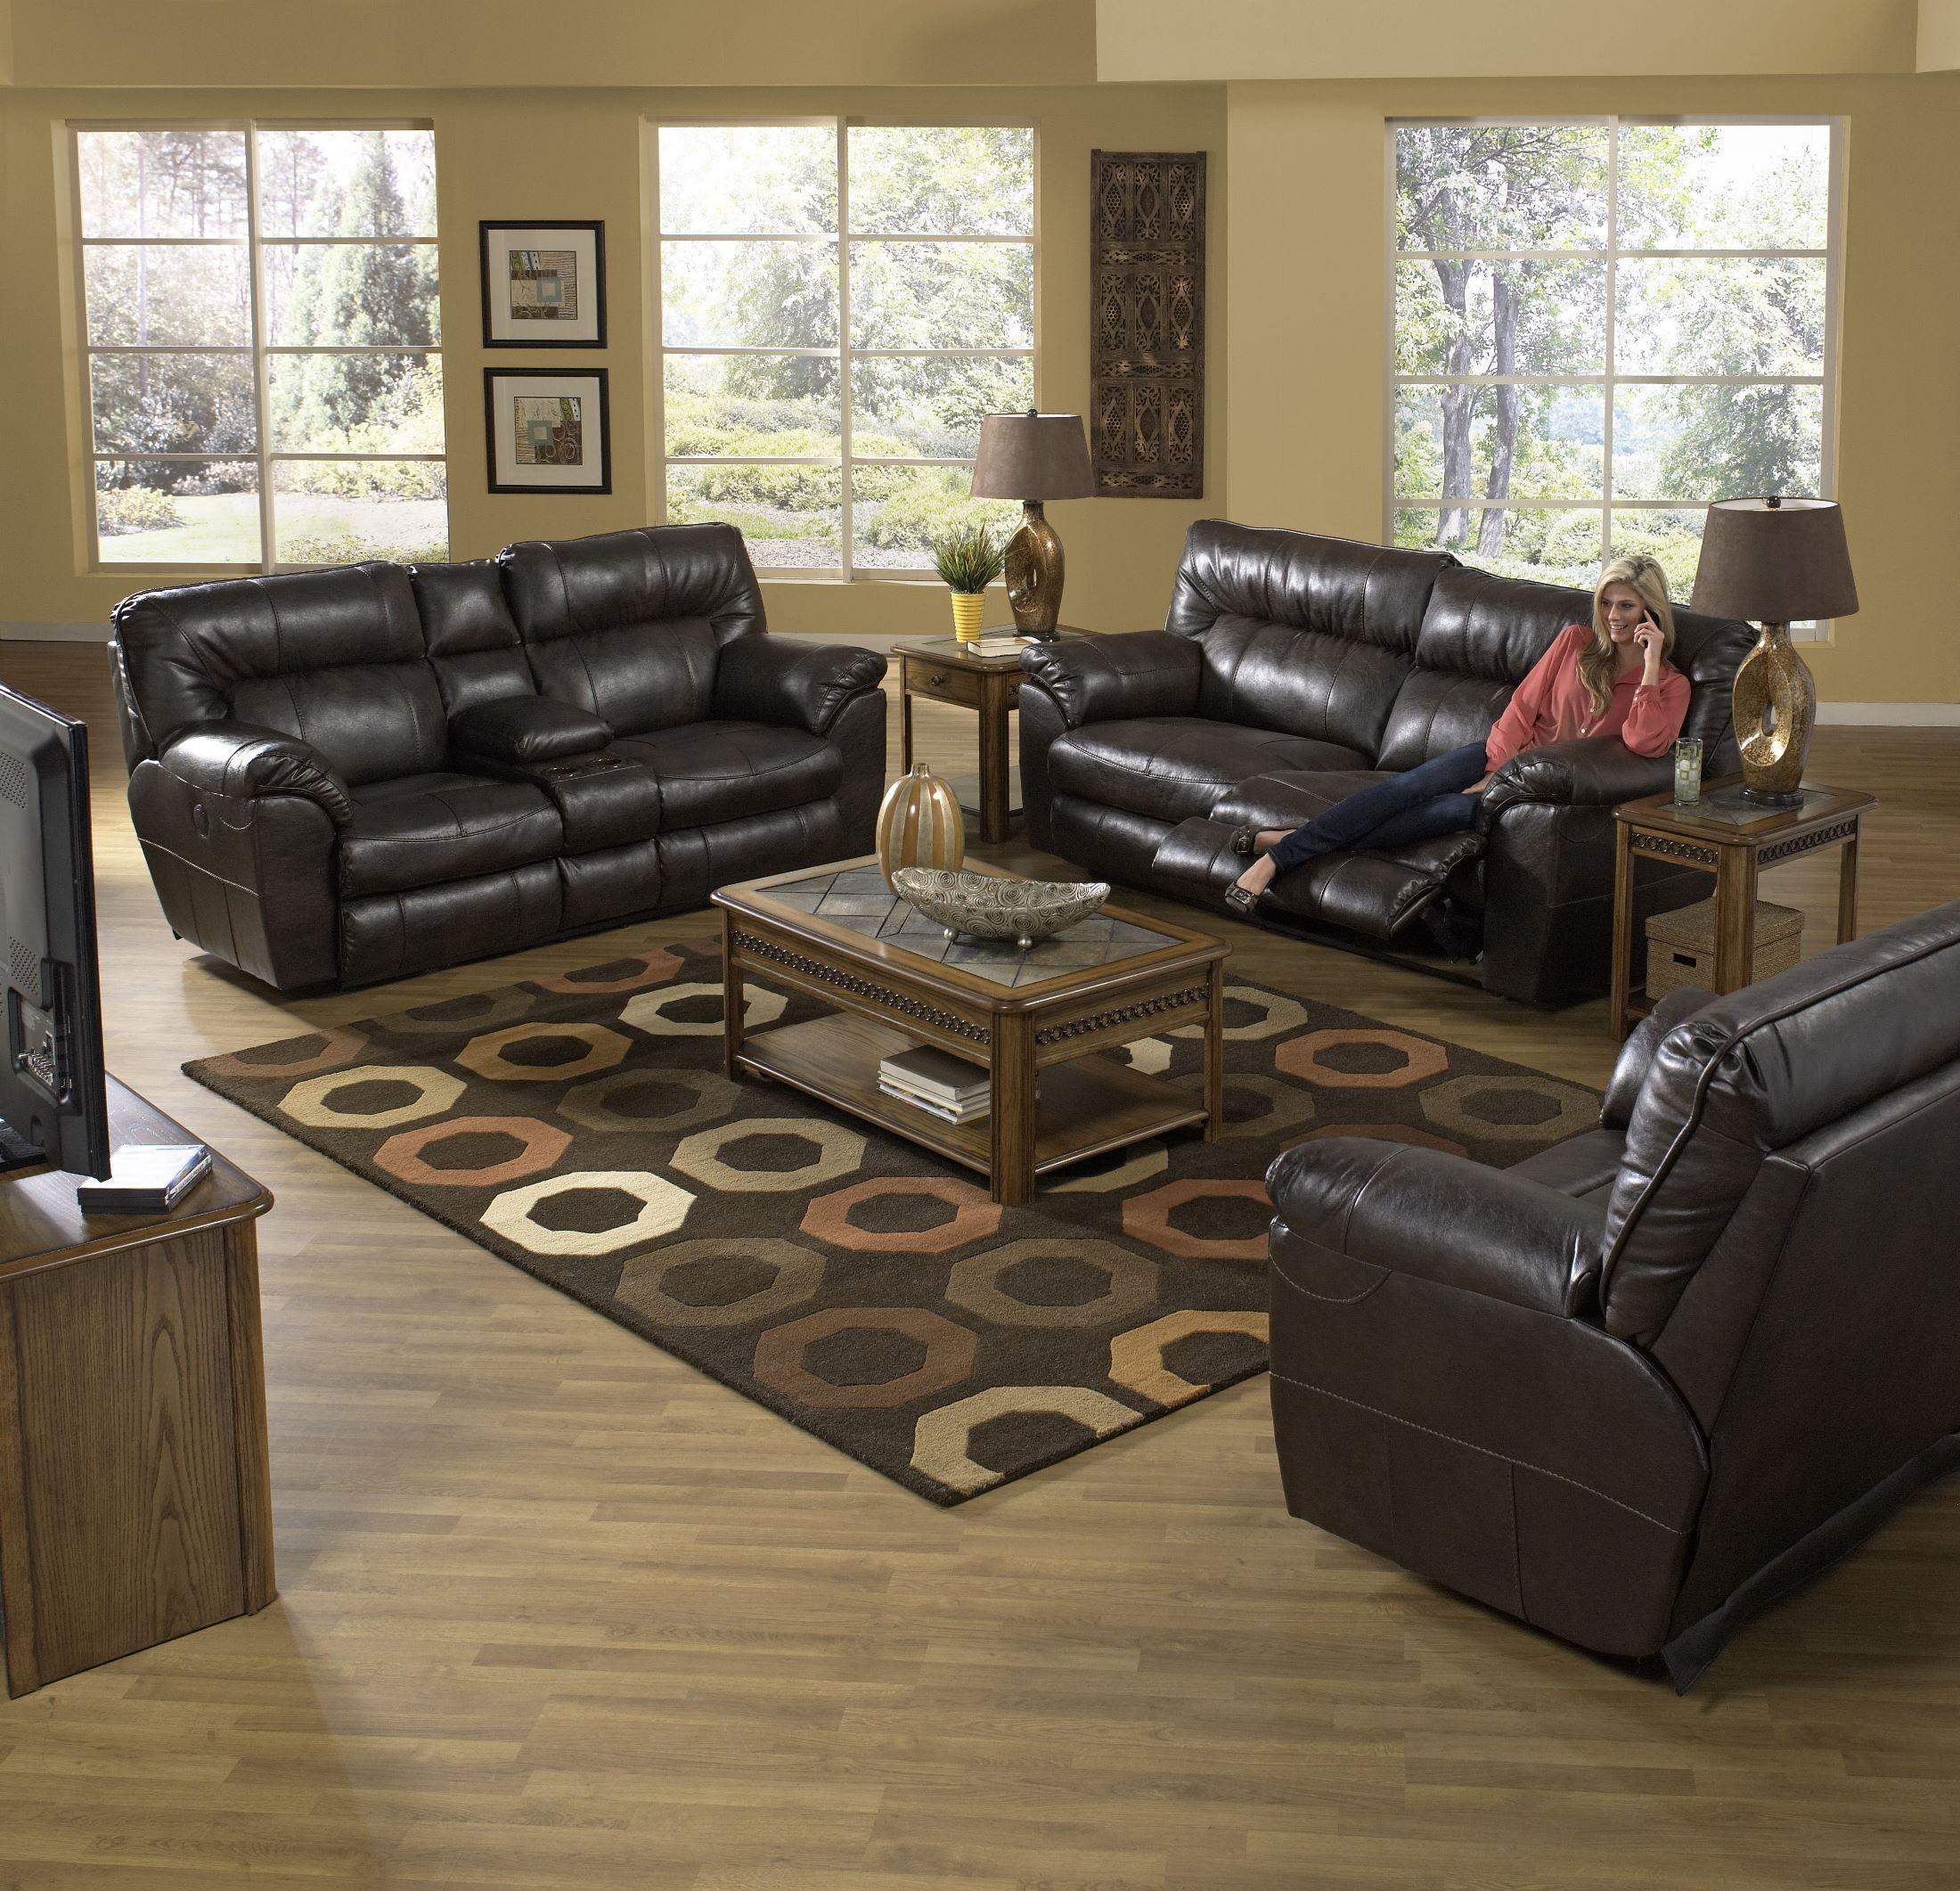 catnapper reclining sofa nolan next brown leather corner godiva power from